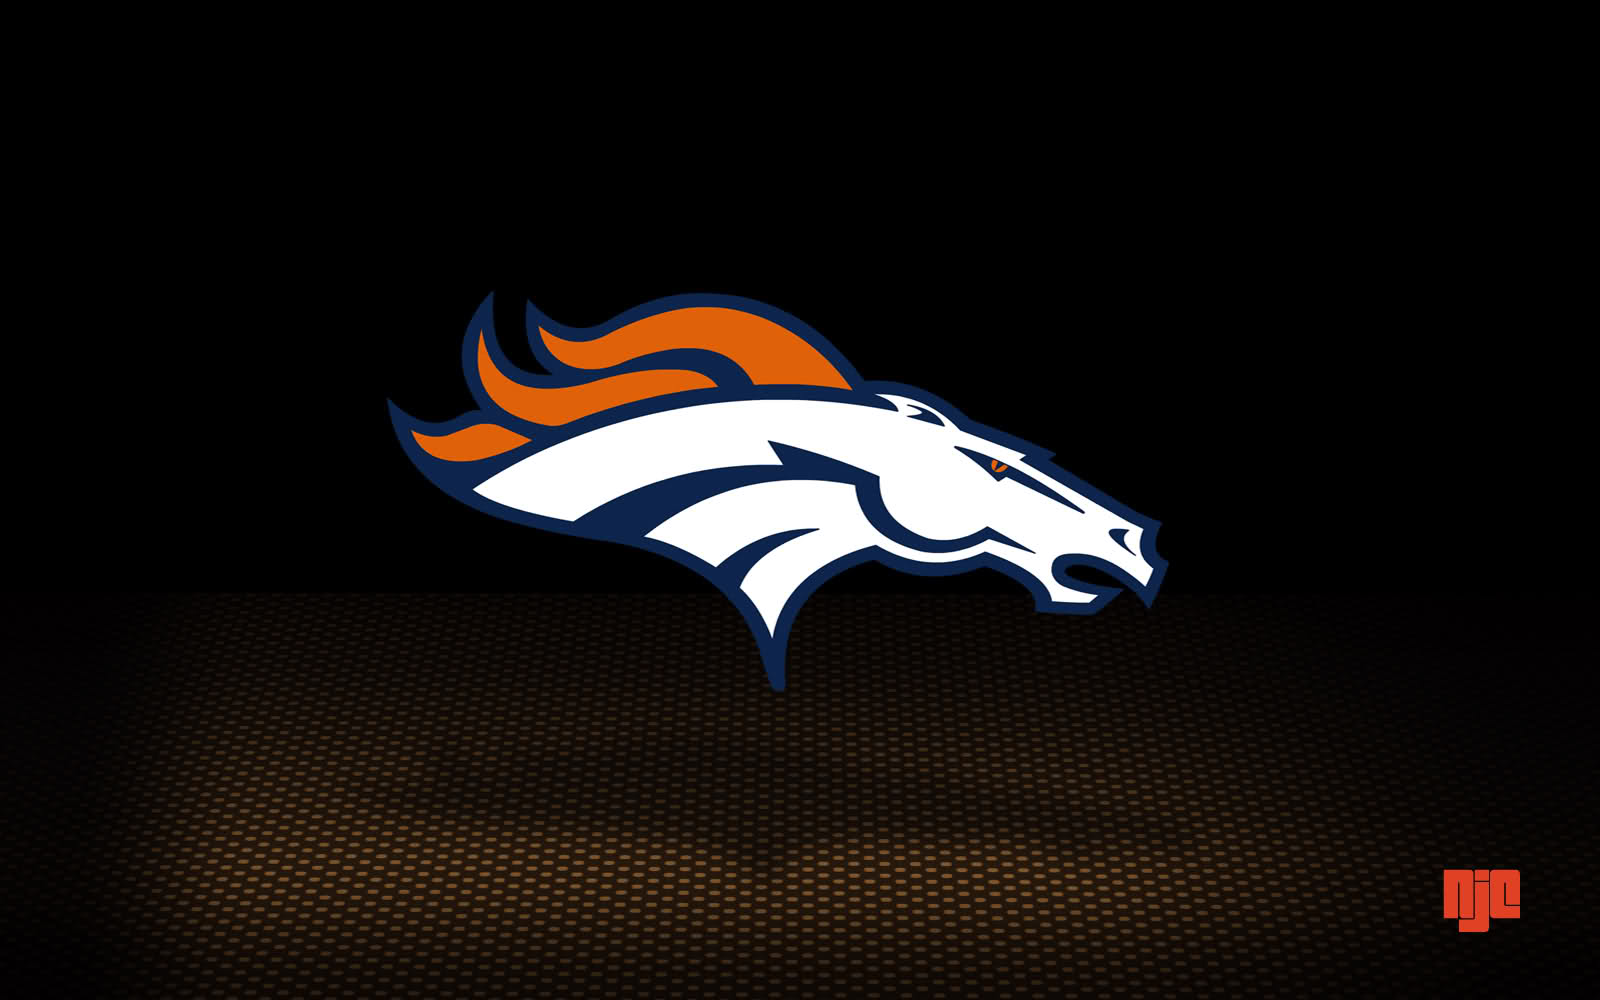 [50+] Denver Broncos Wallpaper Screensavers on WallpaperSafariBroncos Iphone Wallpaper